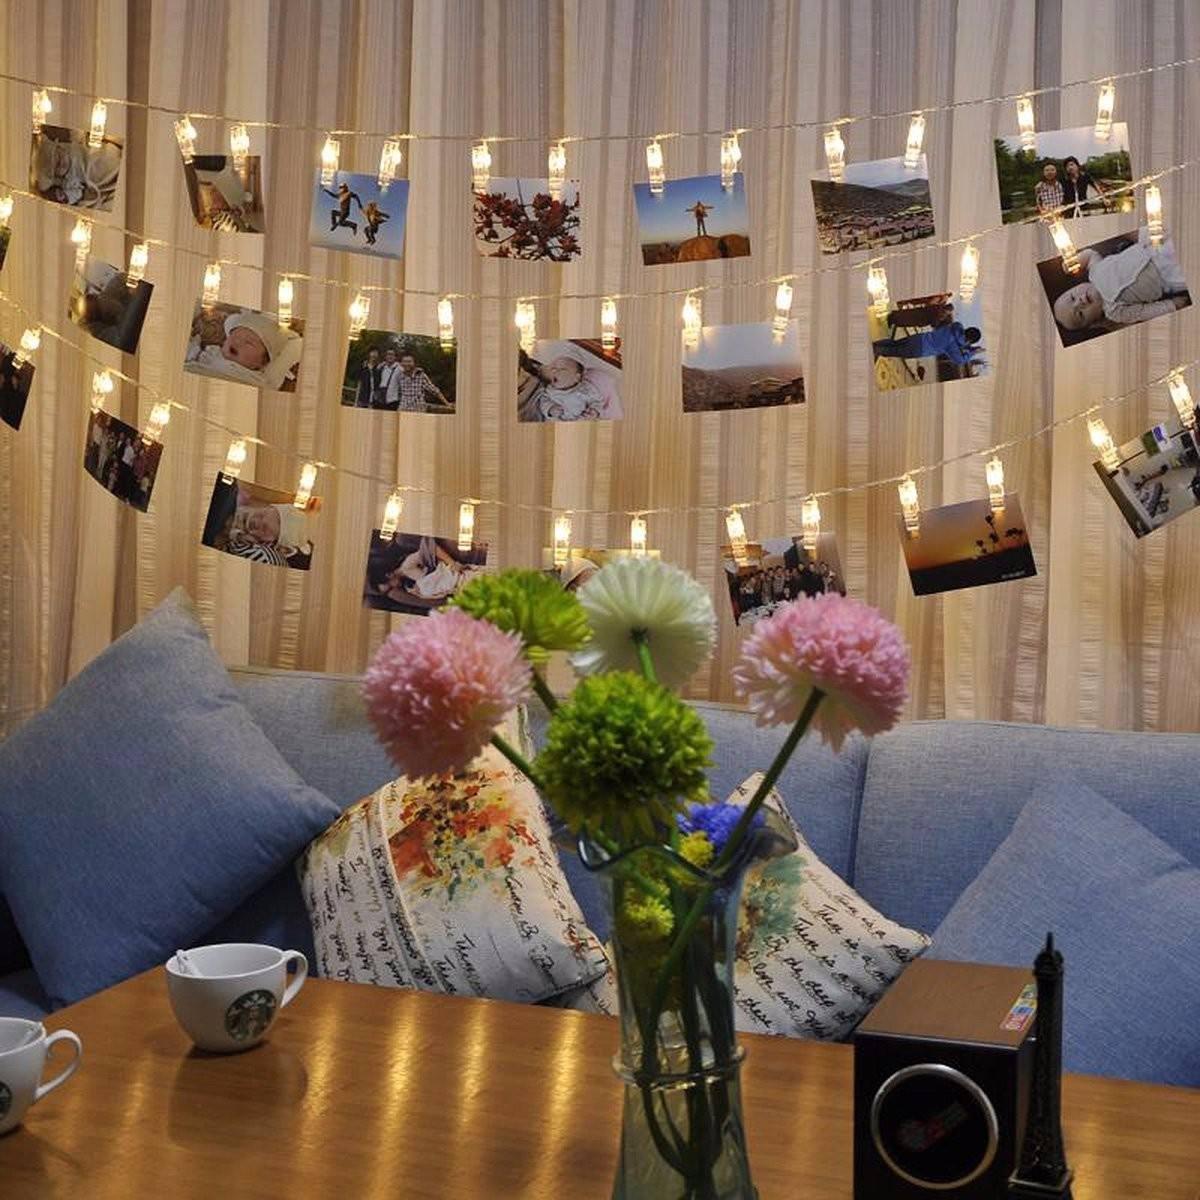 Cordo Luzes Led Varal De Fotos 20 Prendedor Imaginarium